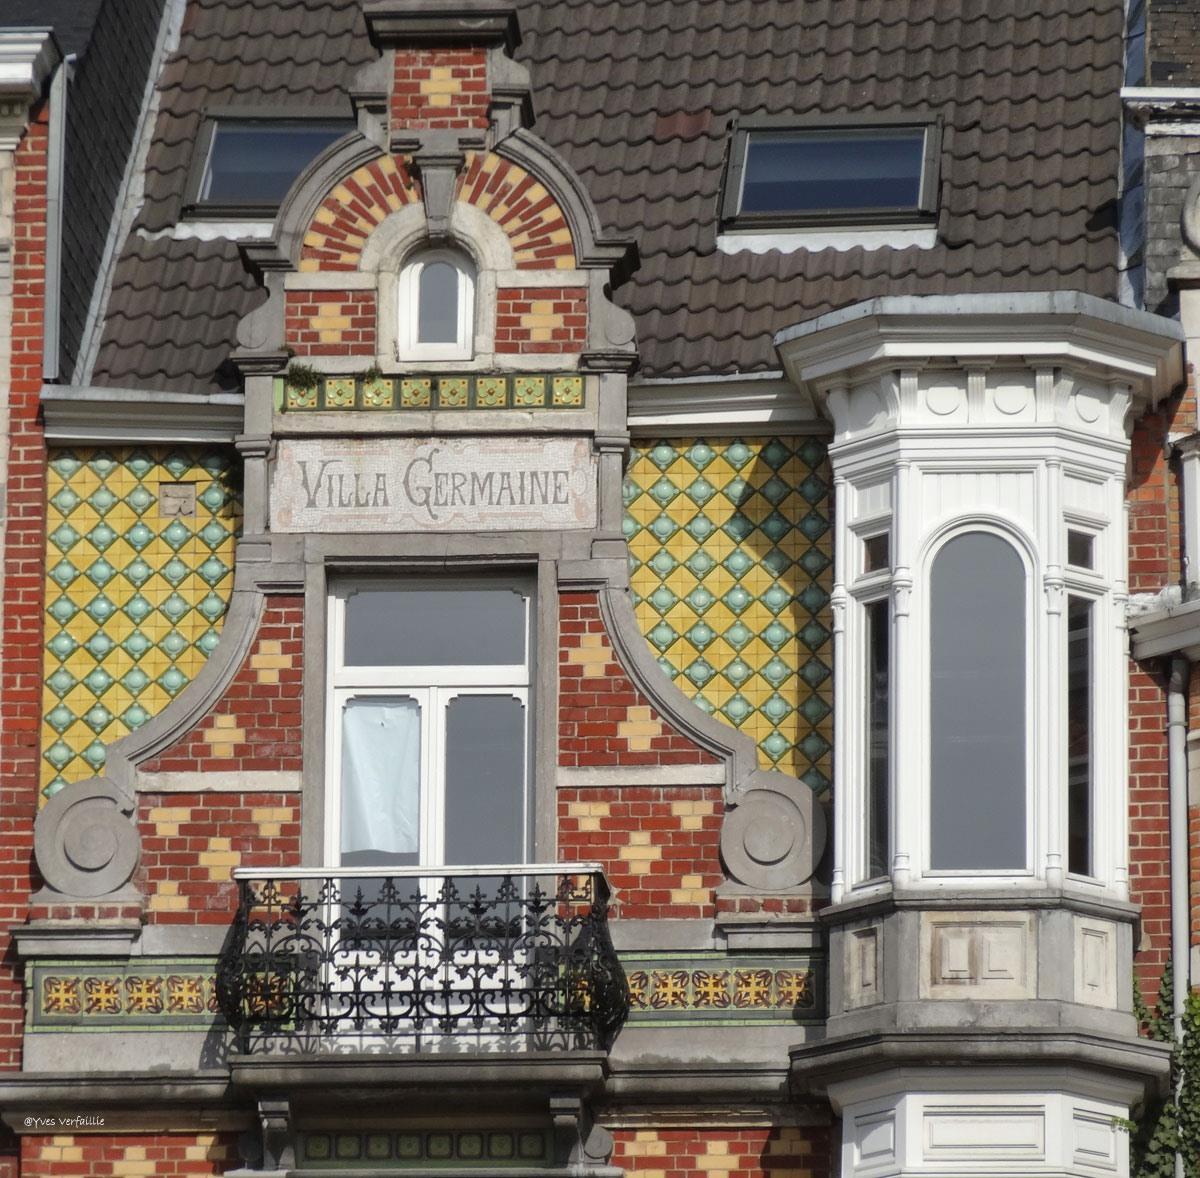 Brussel ongekende weelde aan art nouveau - Art deco barcelona ...